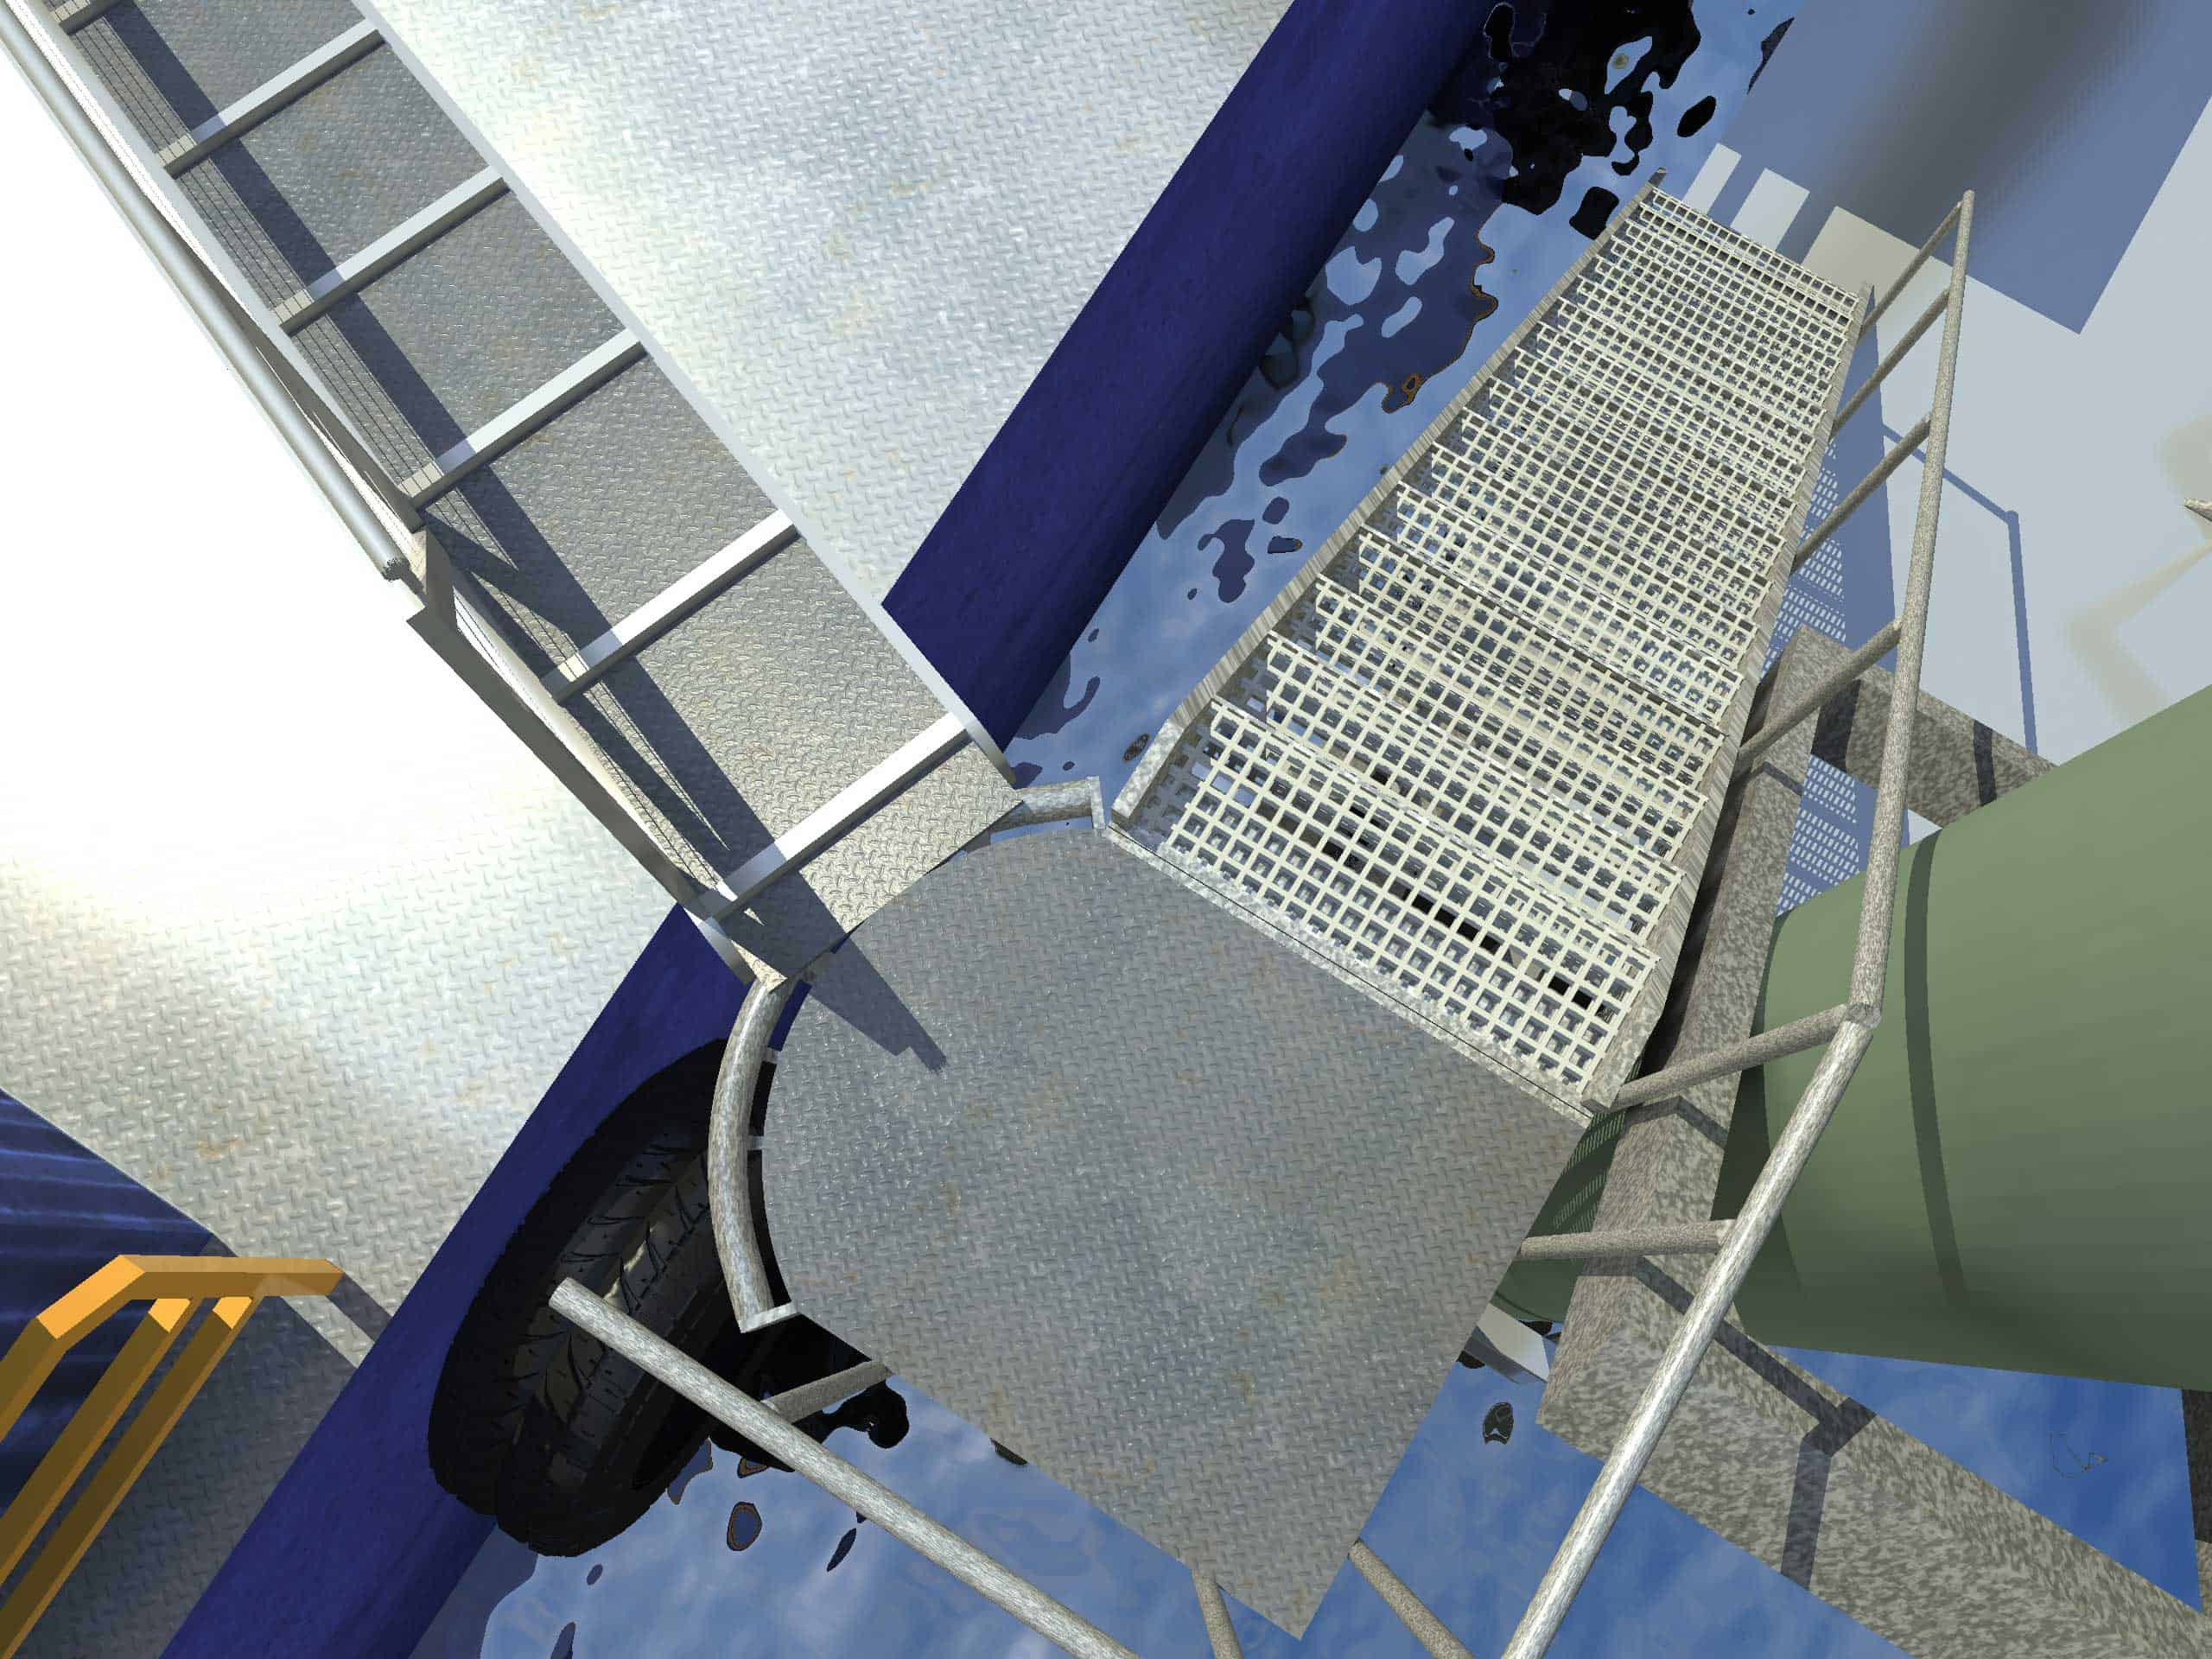 Bridges2000 oplossingen gangways gangway type BL